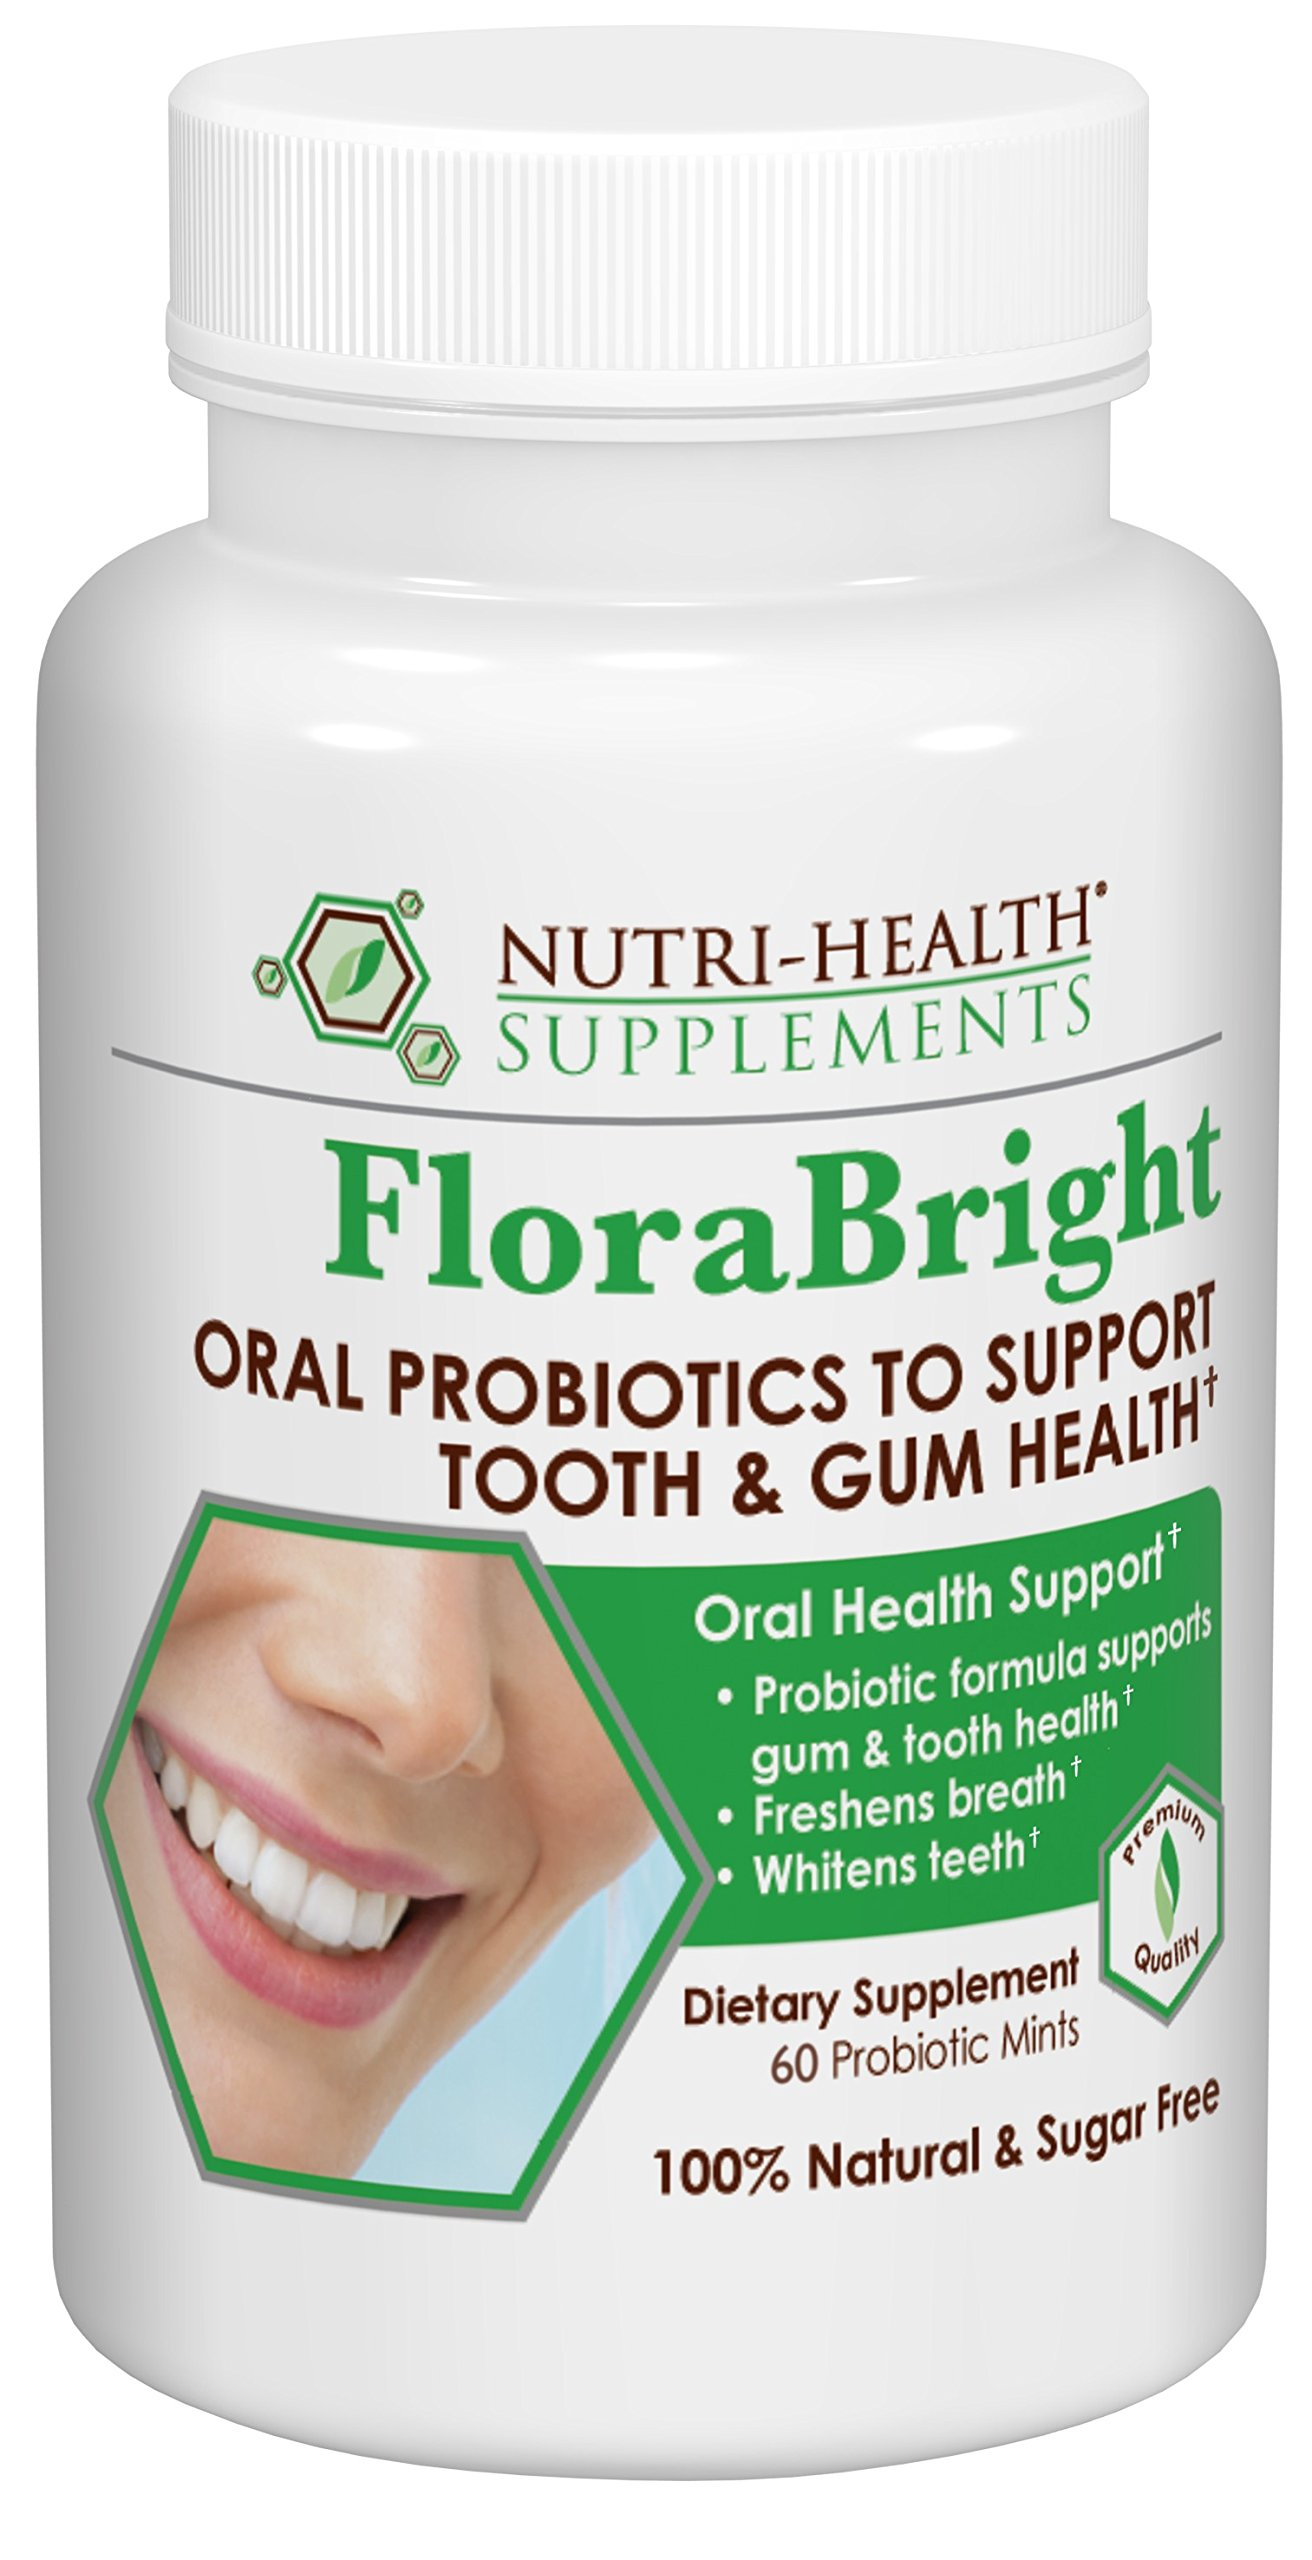 foto de Amazon com: Nutri Health Supplements